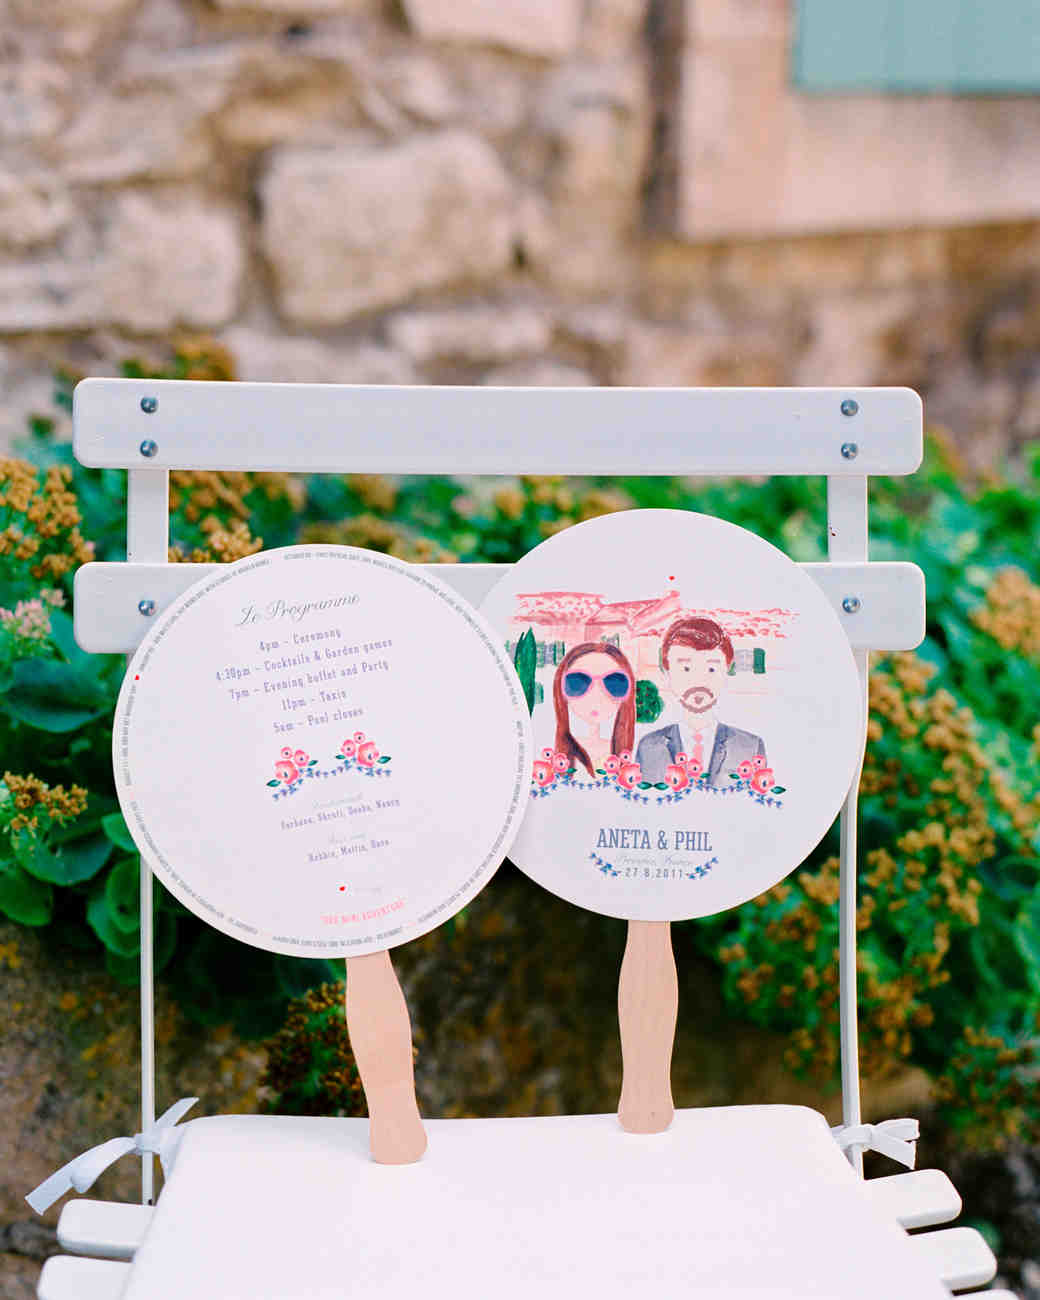 11 wedding program fans to keep guests cool martha stewart weddings maxwellsz